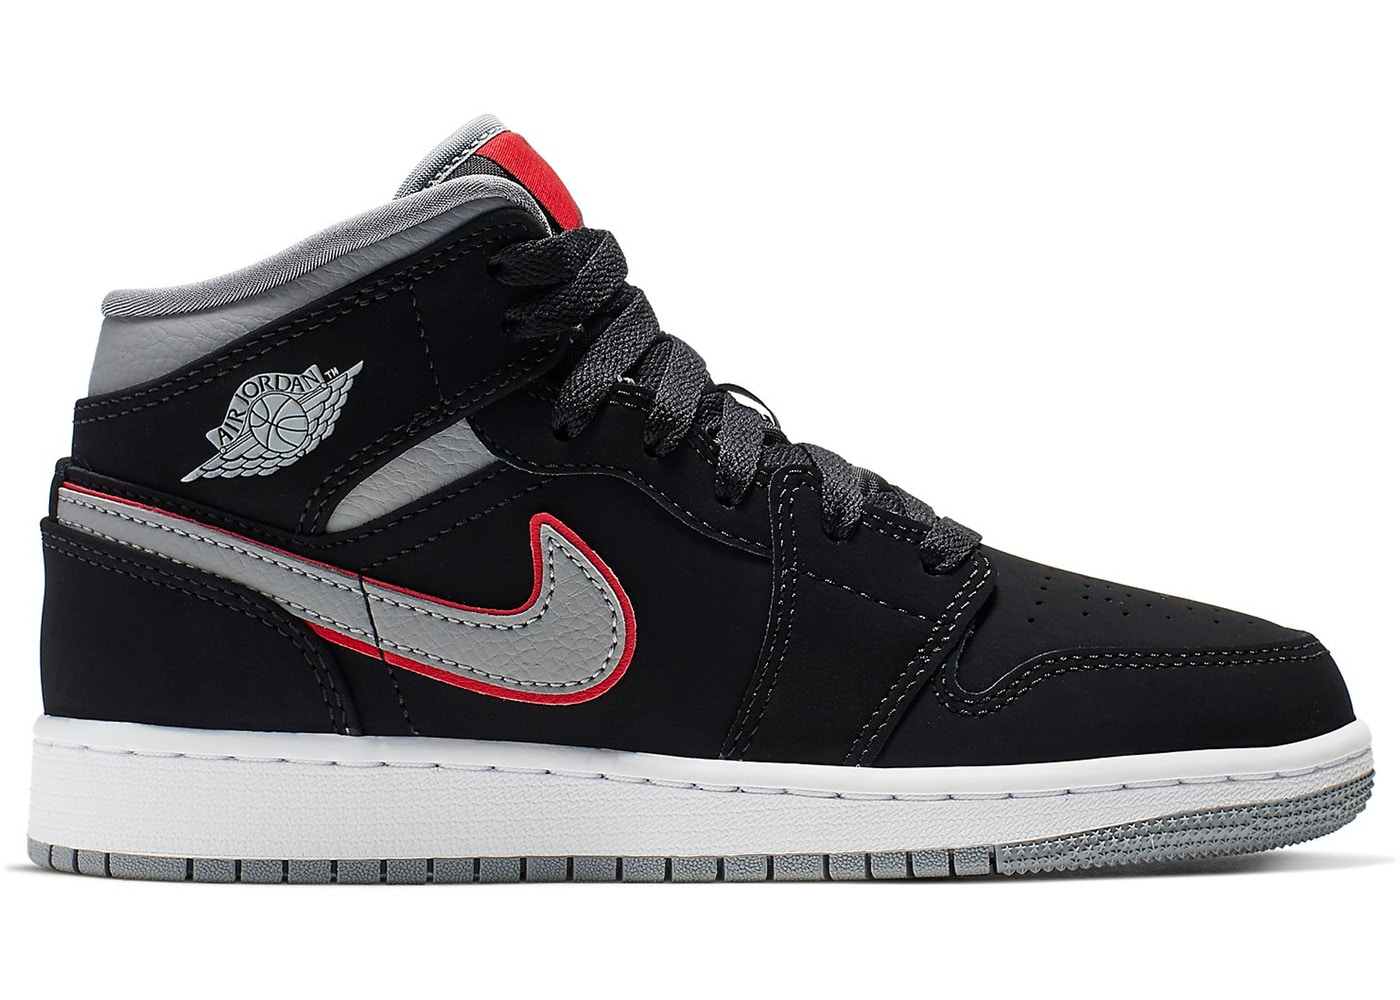 1c336966580657 Jordan 1 Mid Black Particle Grey Gym Red (GS) - 554725-060